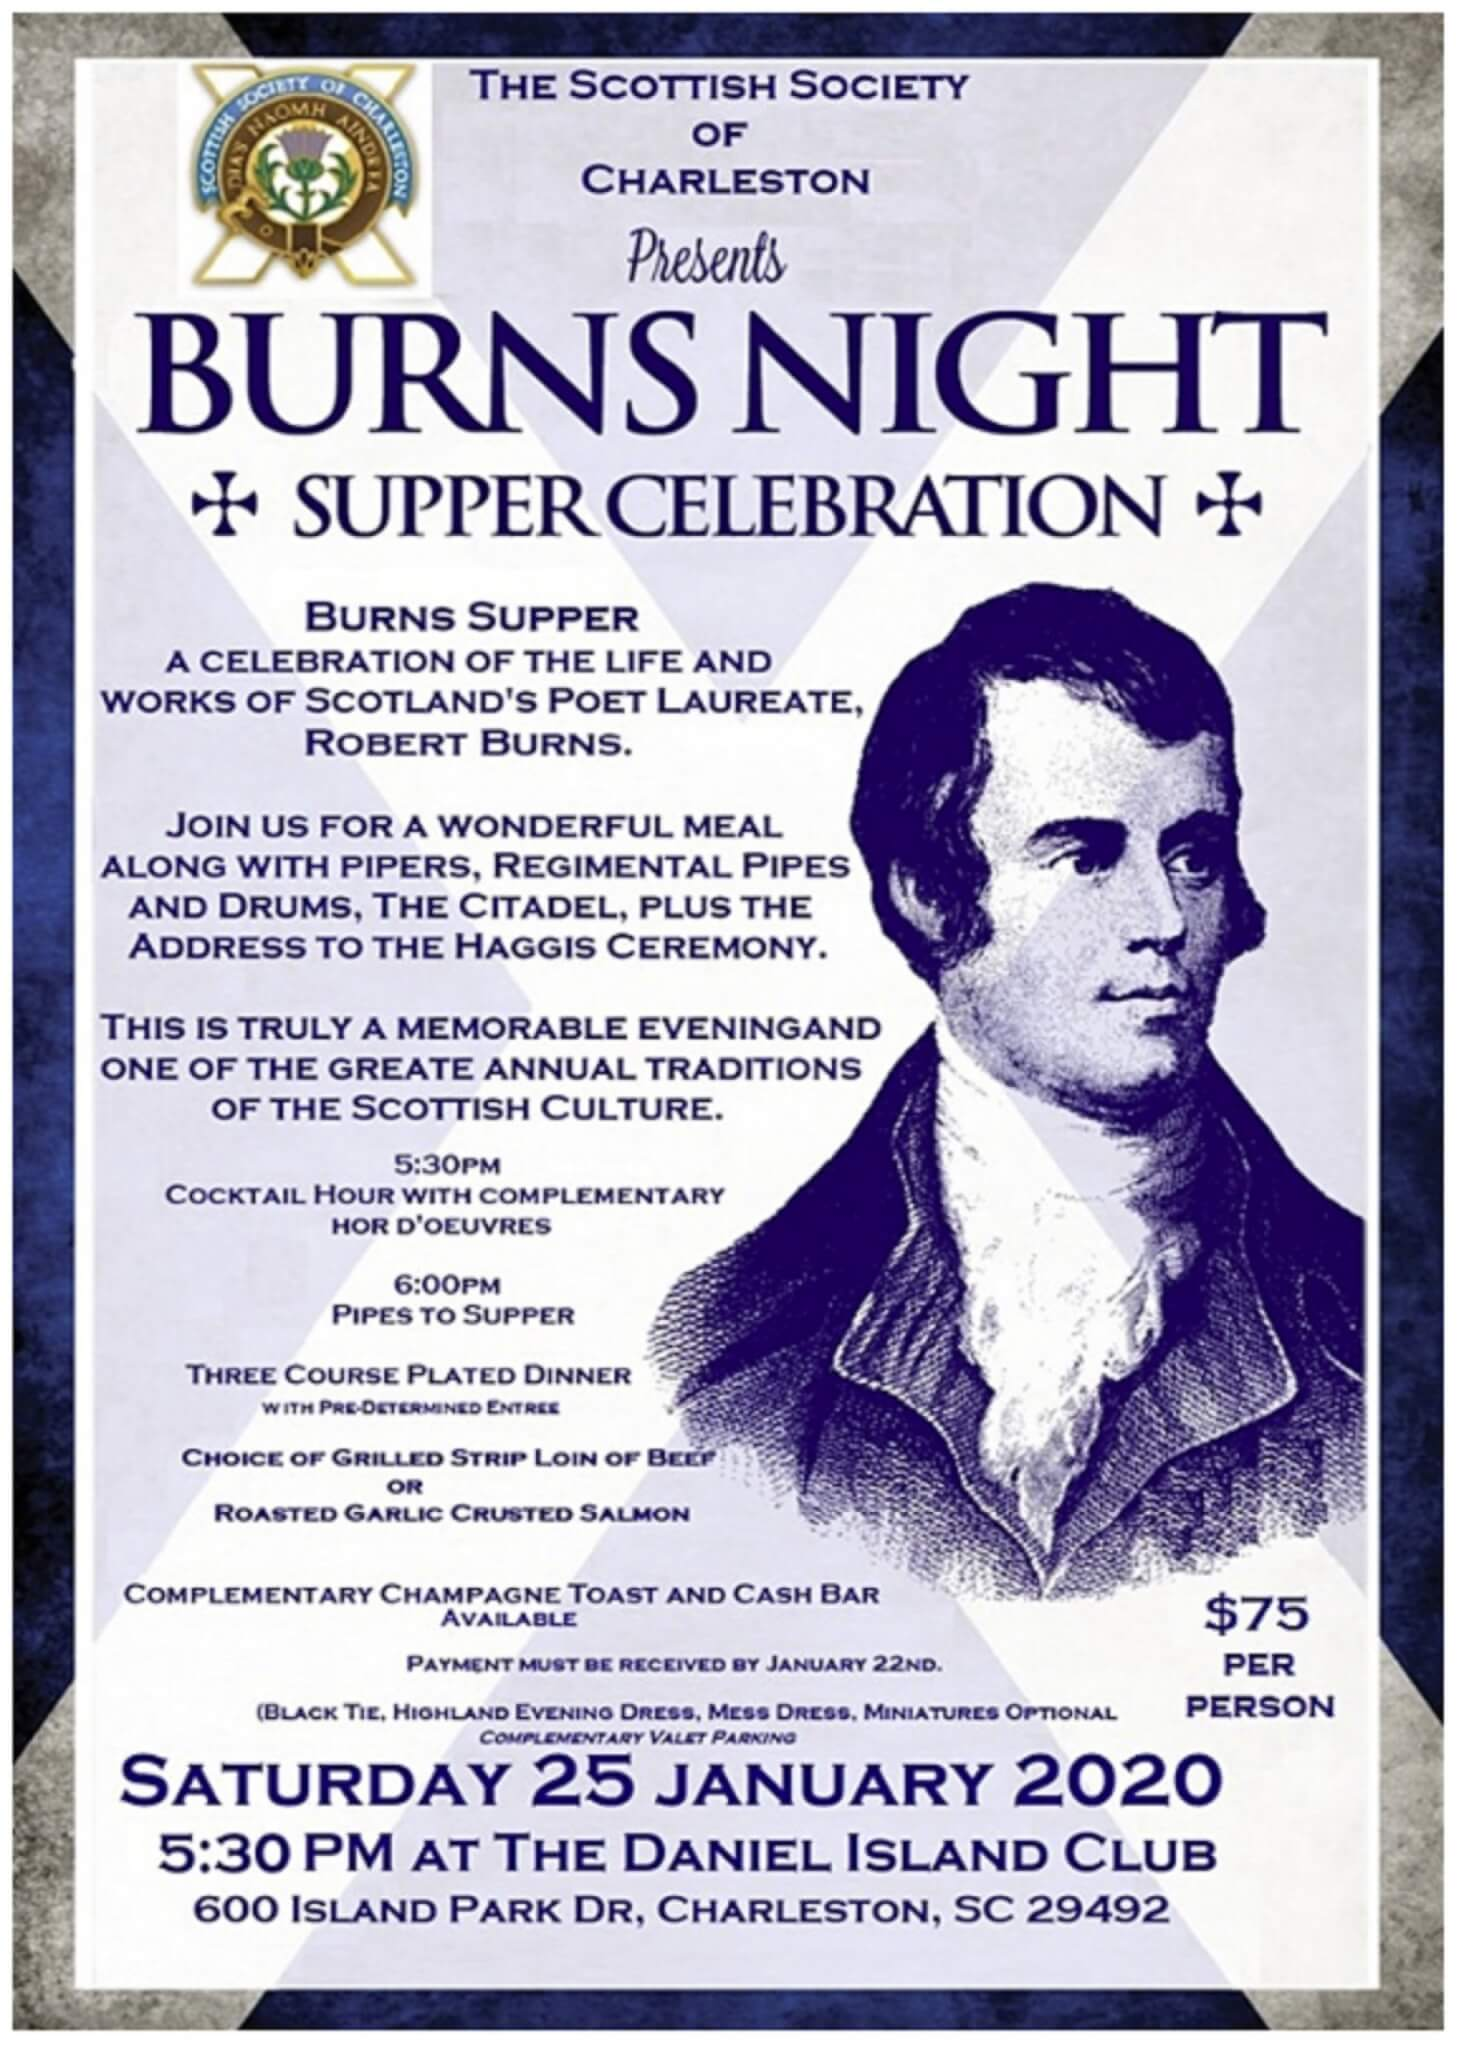 2020 Burns Supper @ Daniel Island Club